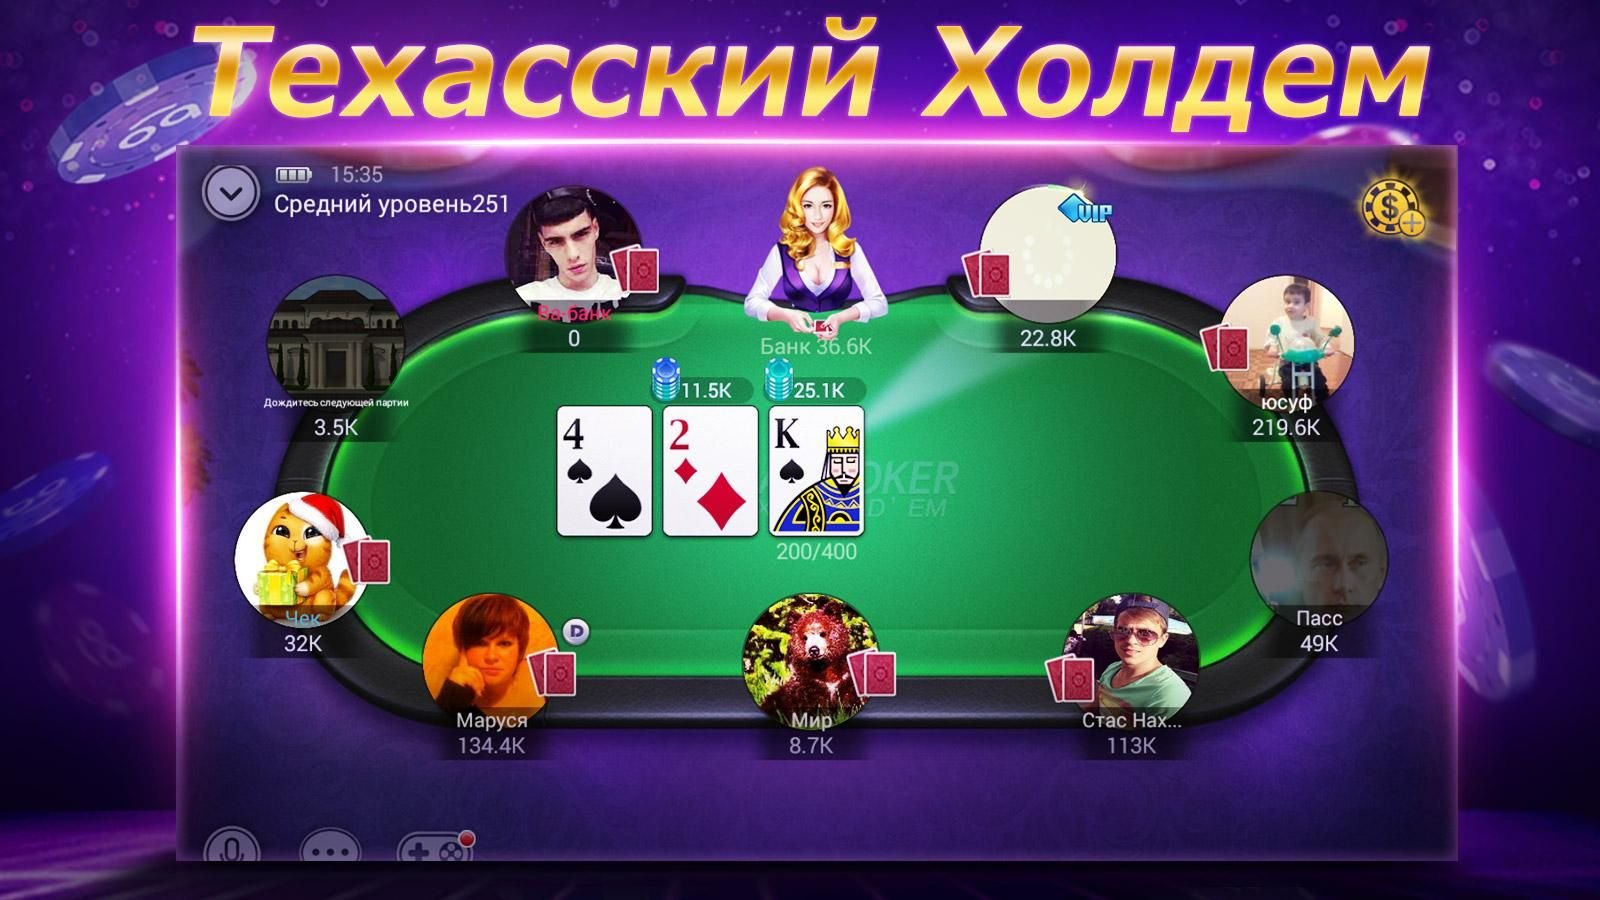 https://tabsgame.ru/screens/2017-03-01/1488355409_t2cma.jpg